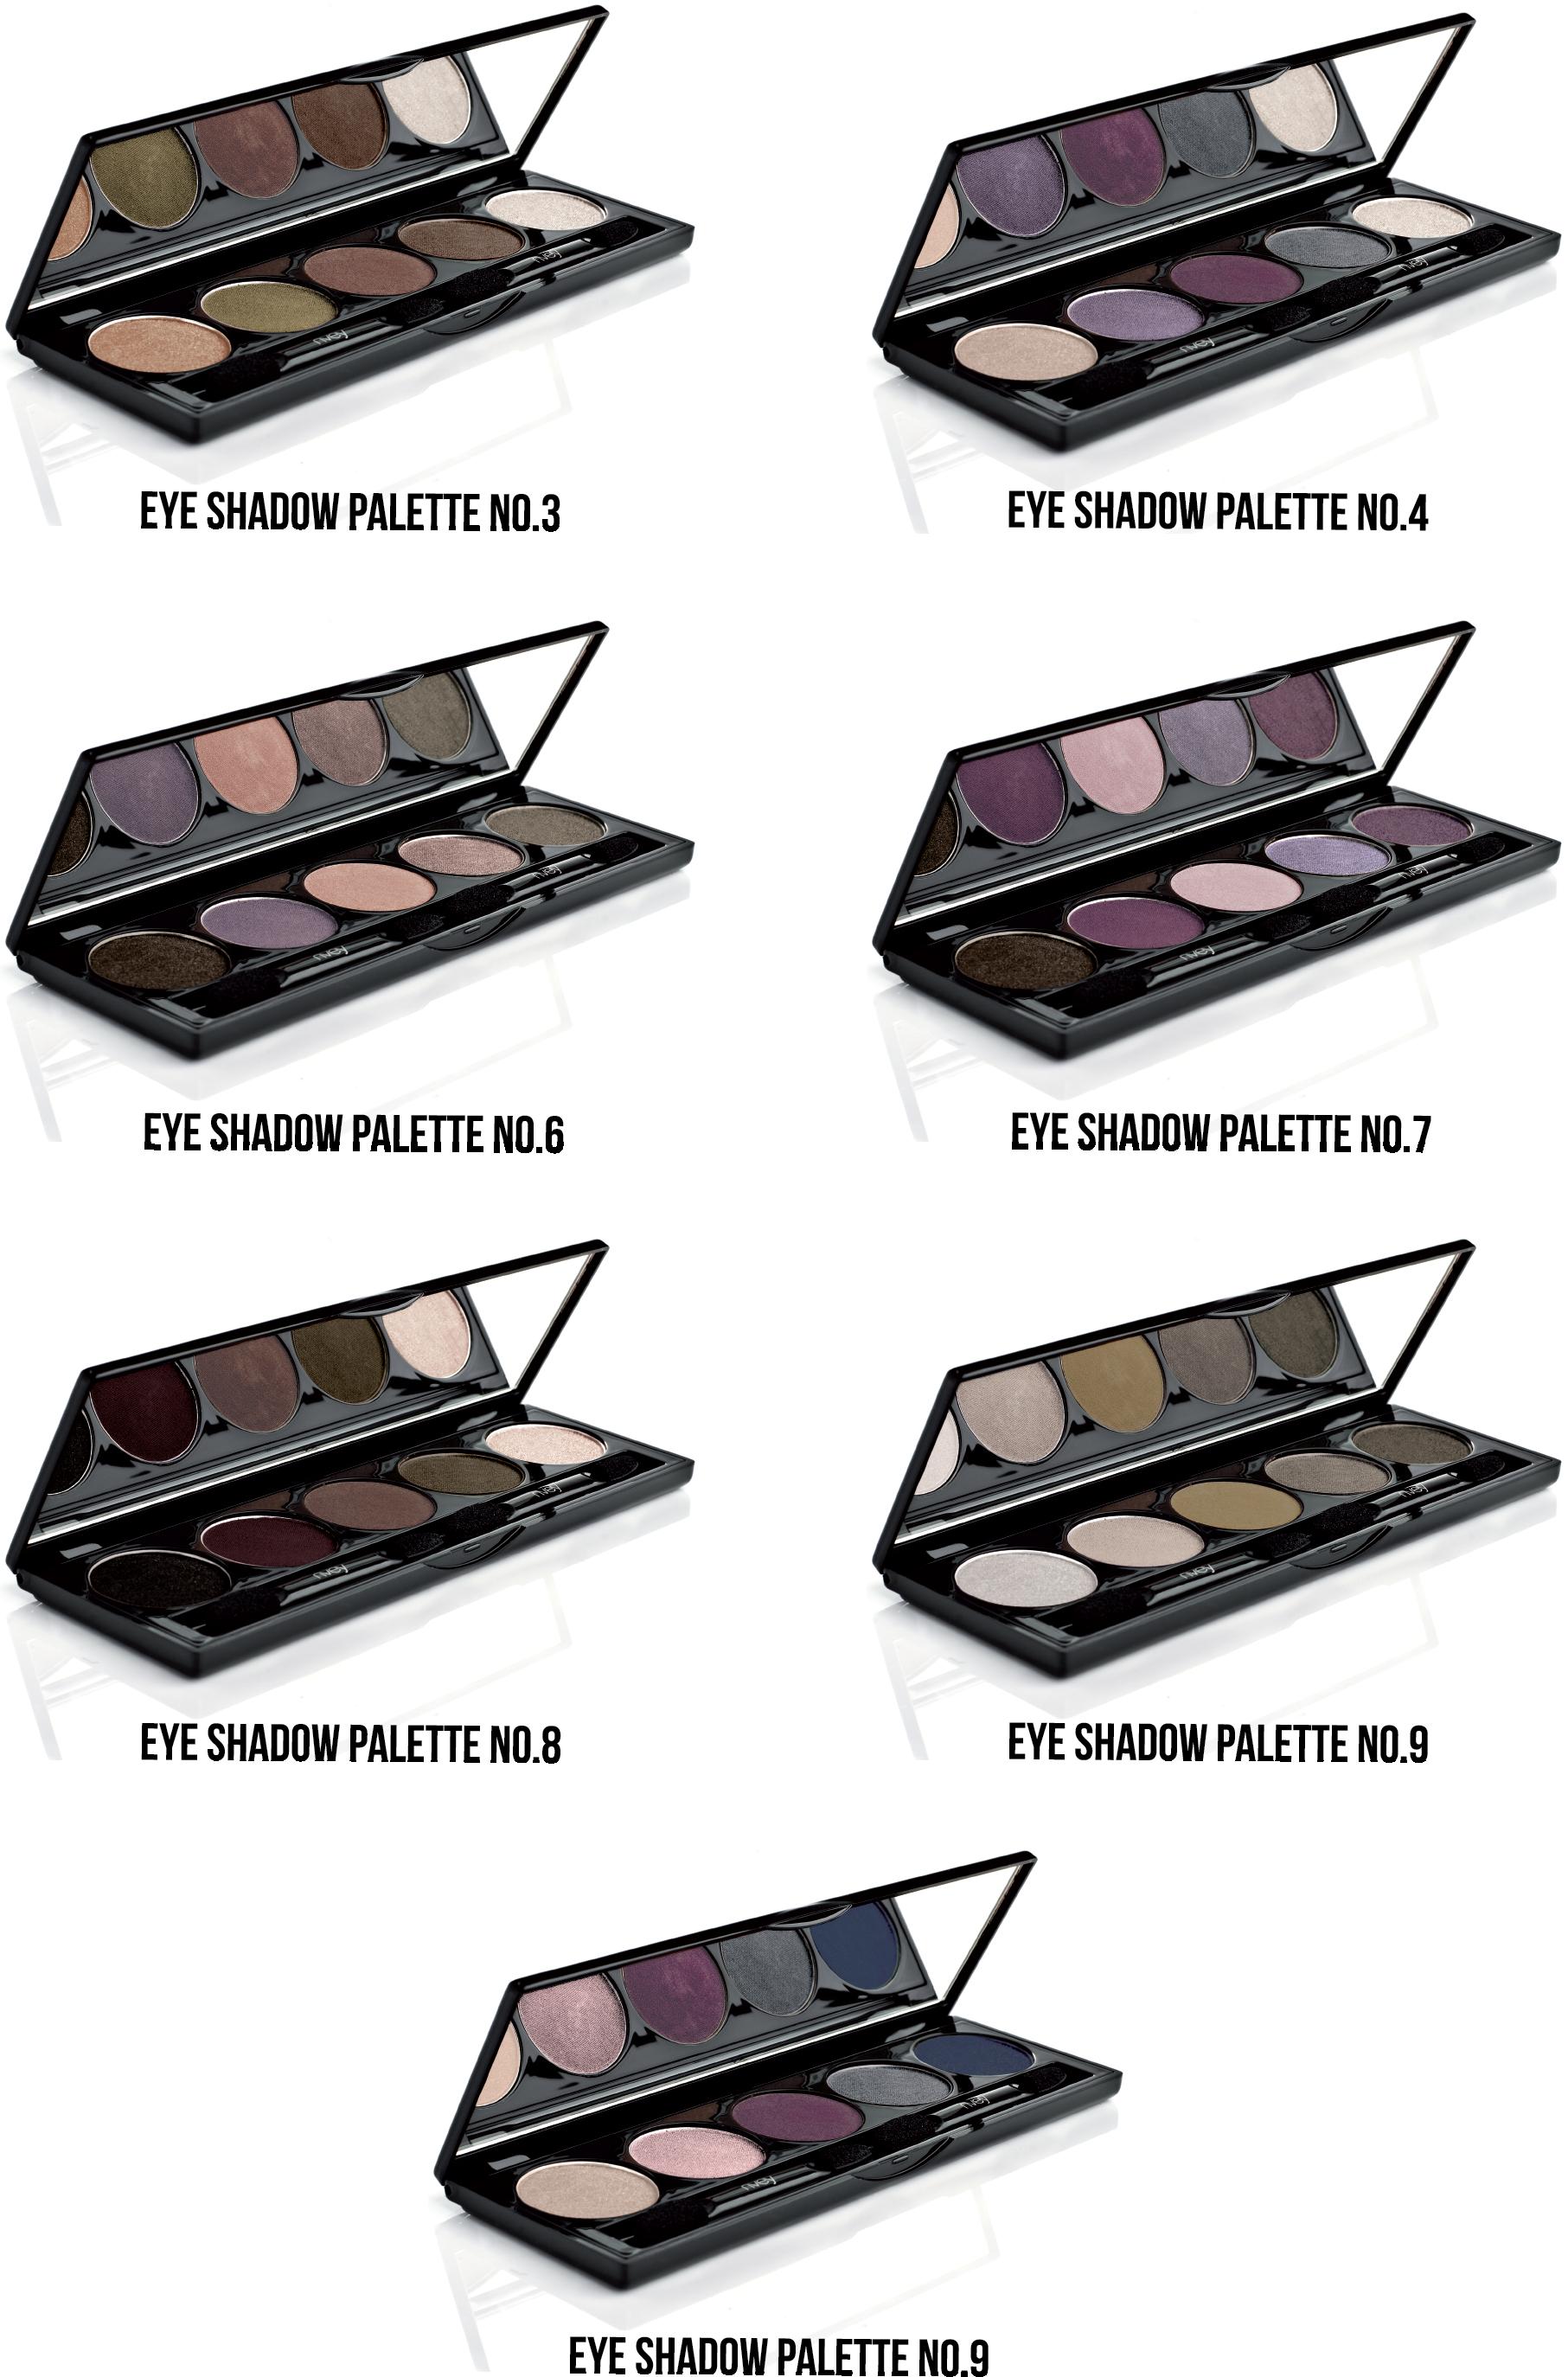 Eye clipart eye makeup. Eyeshadow palette nvey eco